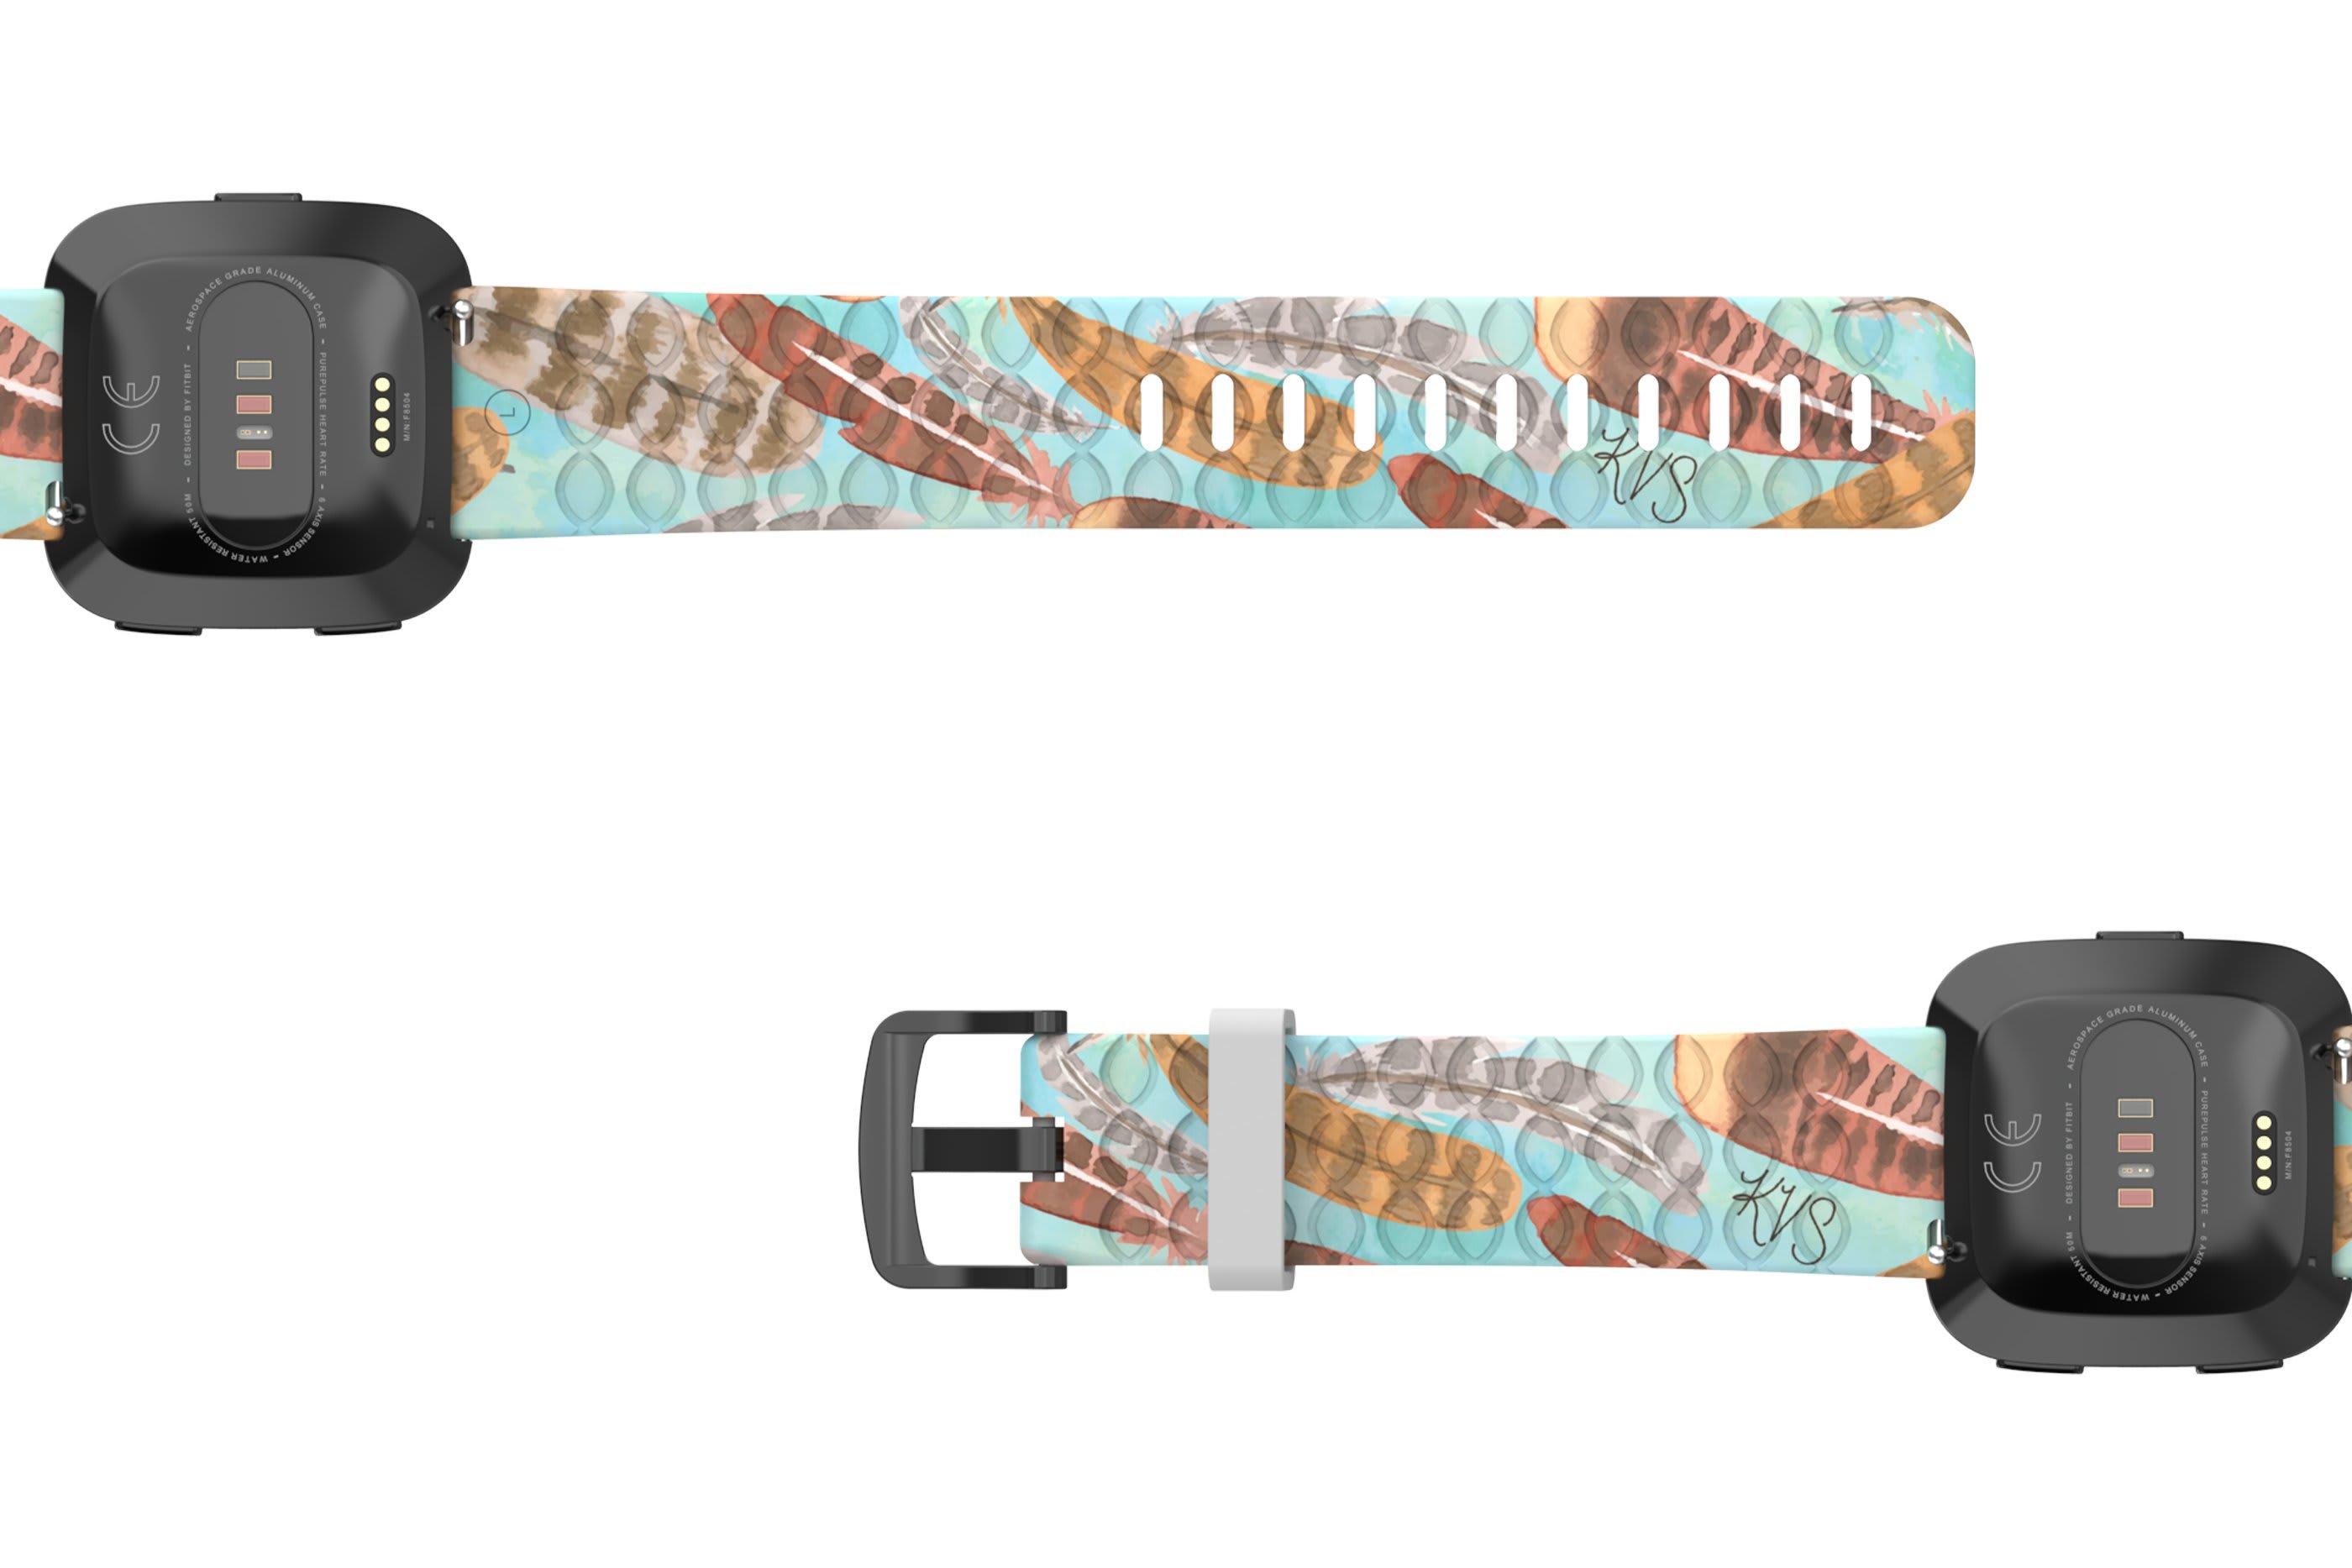 Brave - Katie Van Slyke Fitbit Versa   watch band with gray hardware viewed bottom up